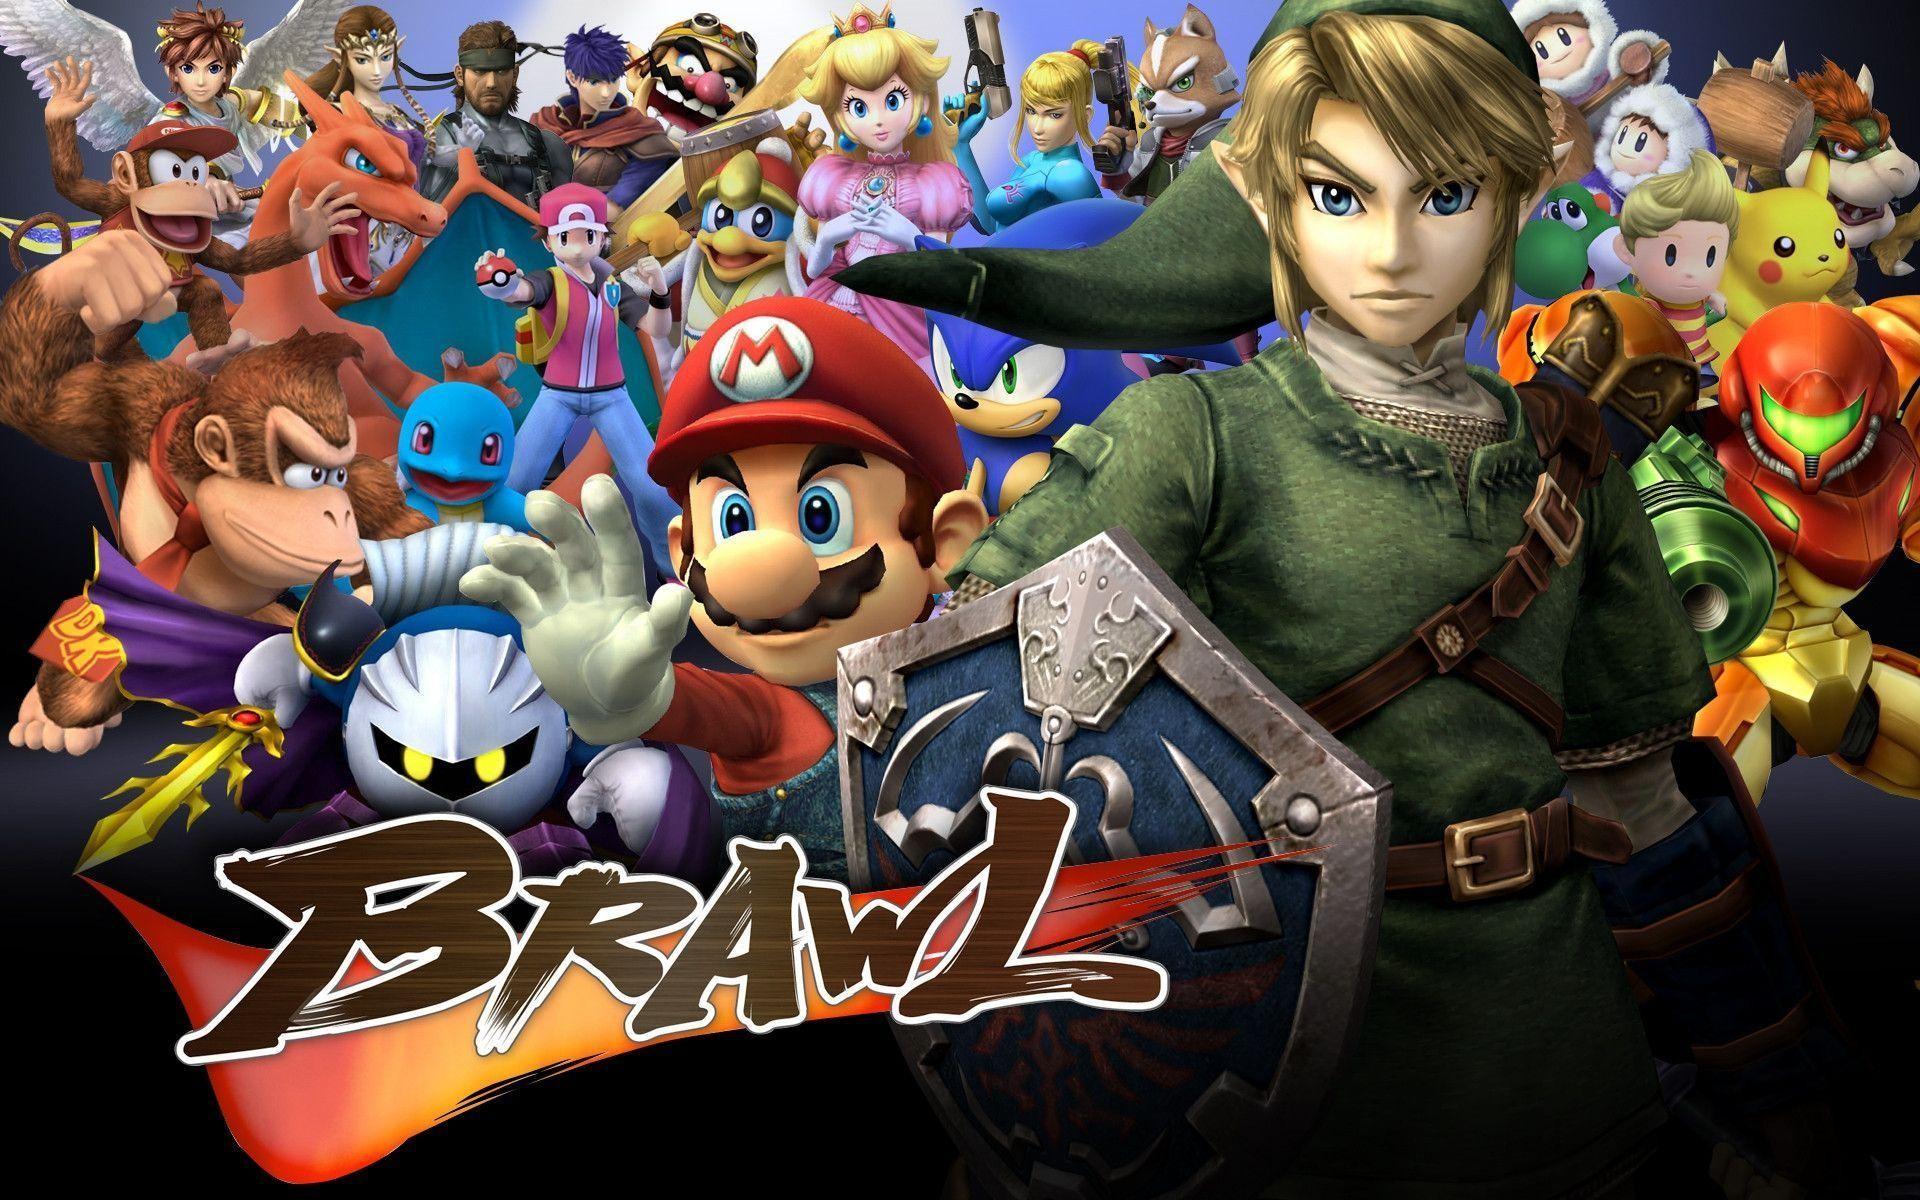 Ssbb Wallpaper Super Smash Bros Brawl – HD Wallpapers